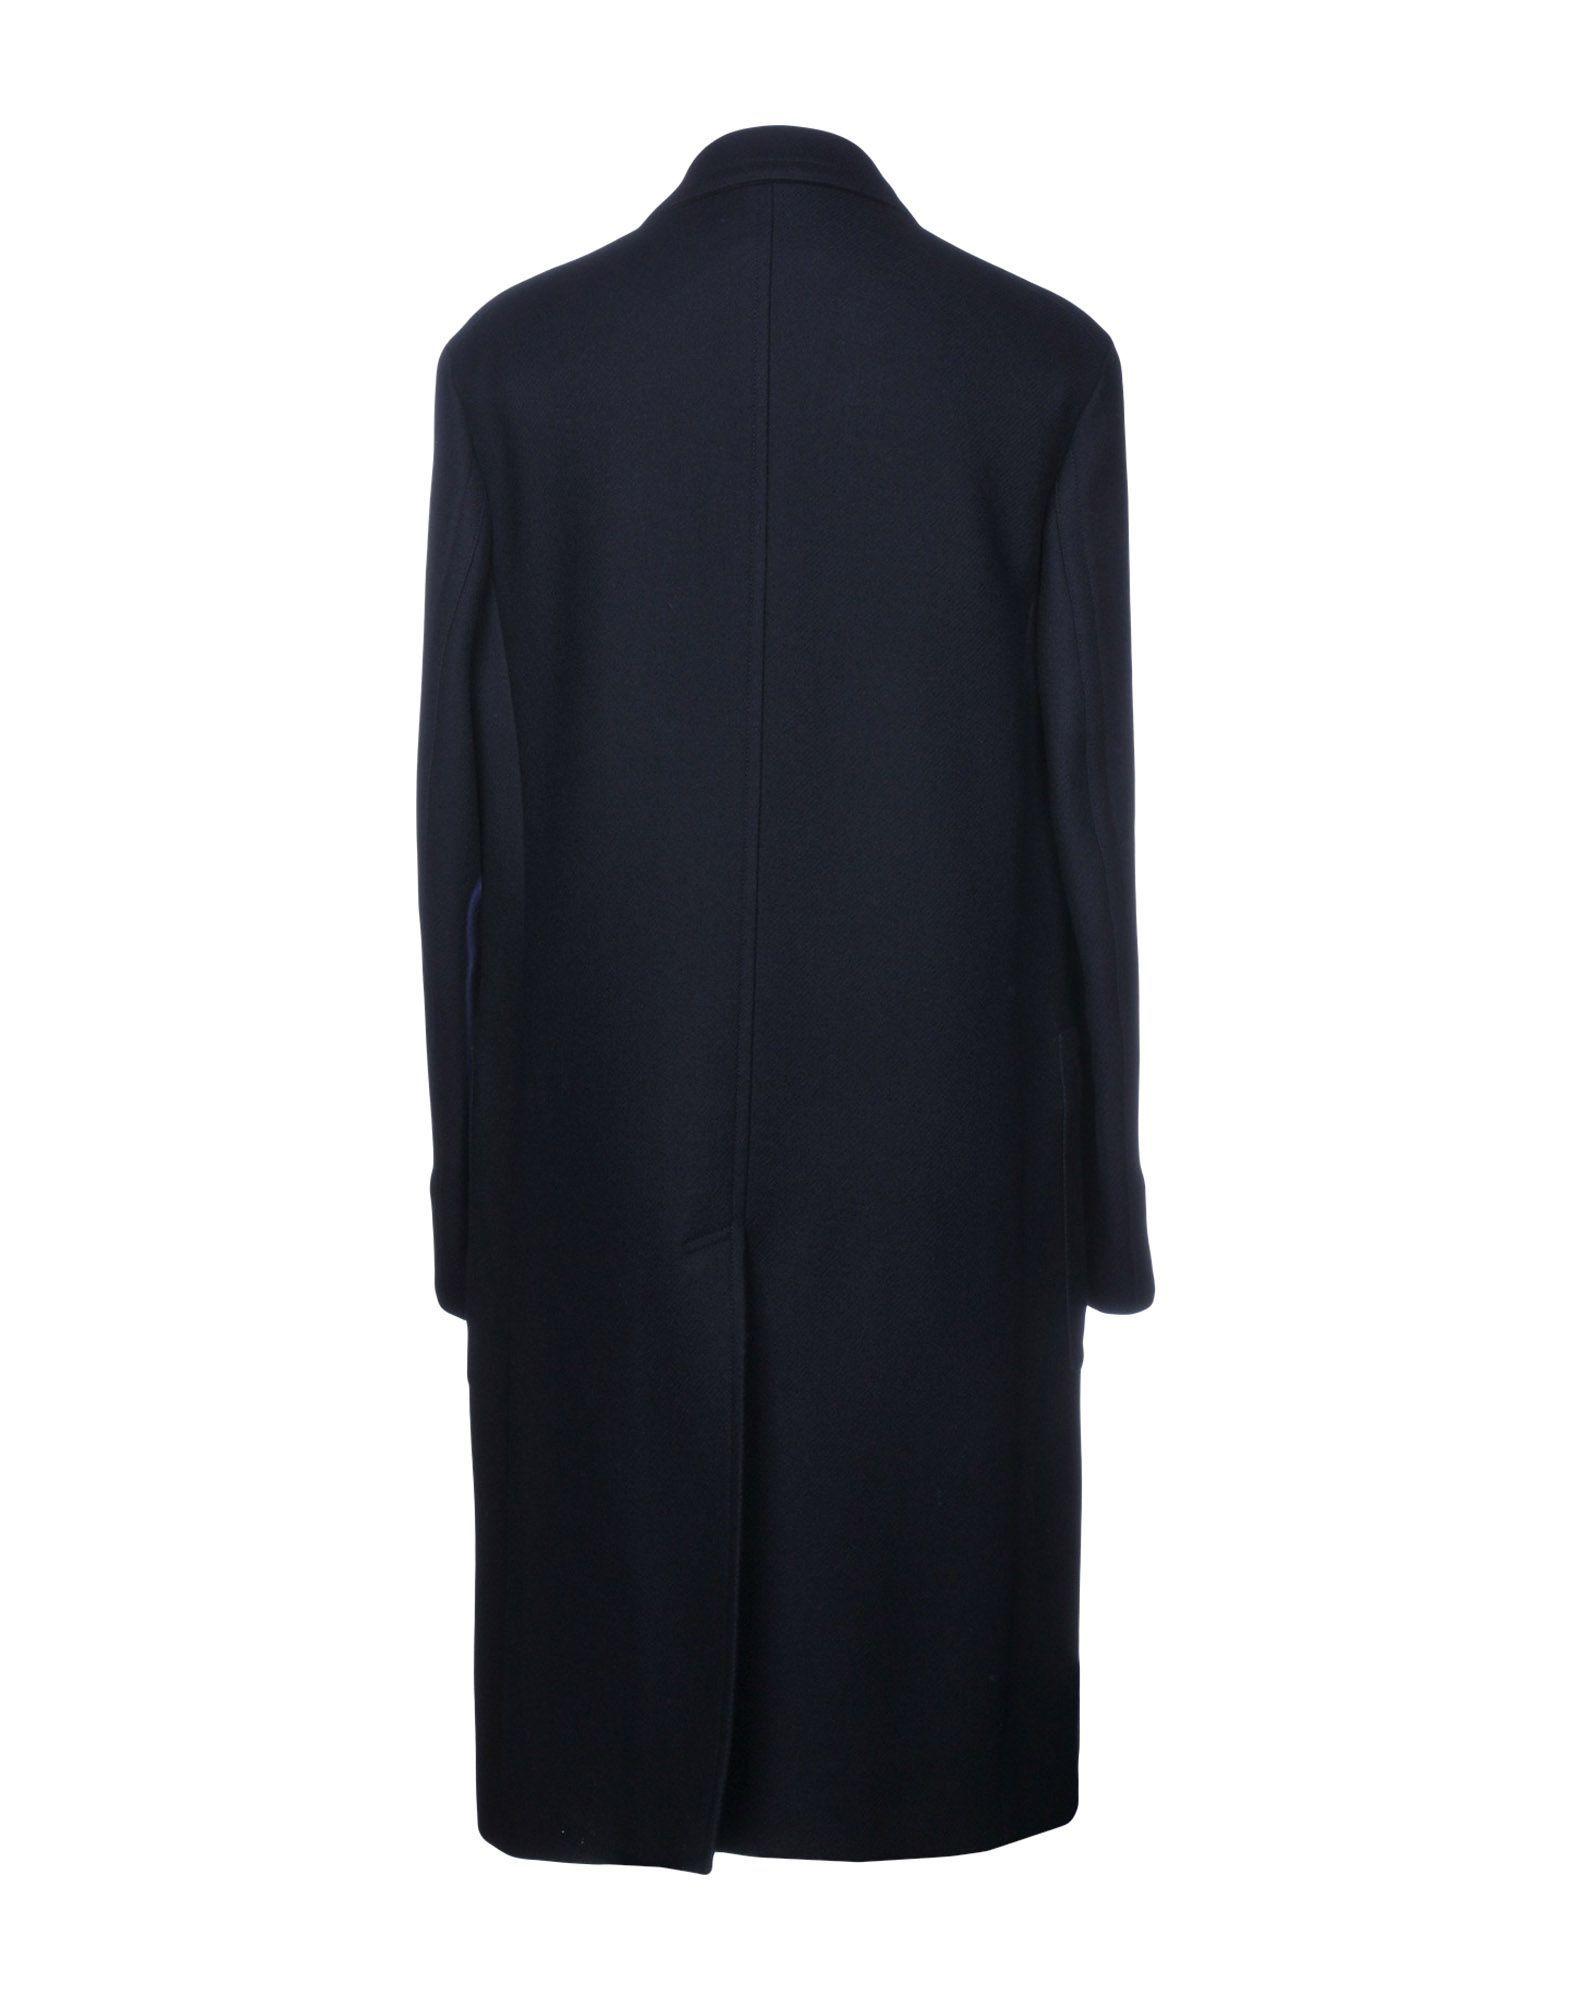 Maison Margiela Dark Blue Virgin Wool Overcoat